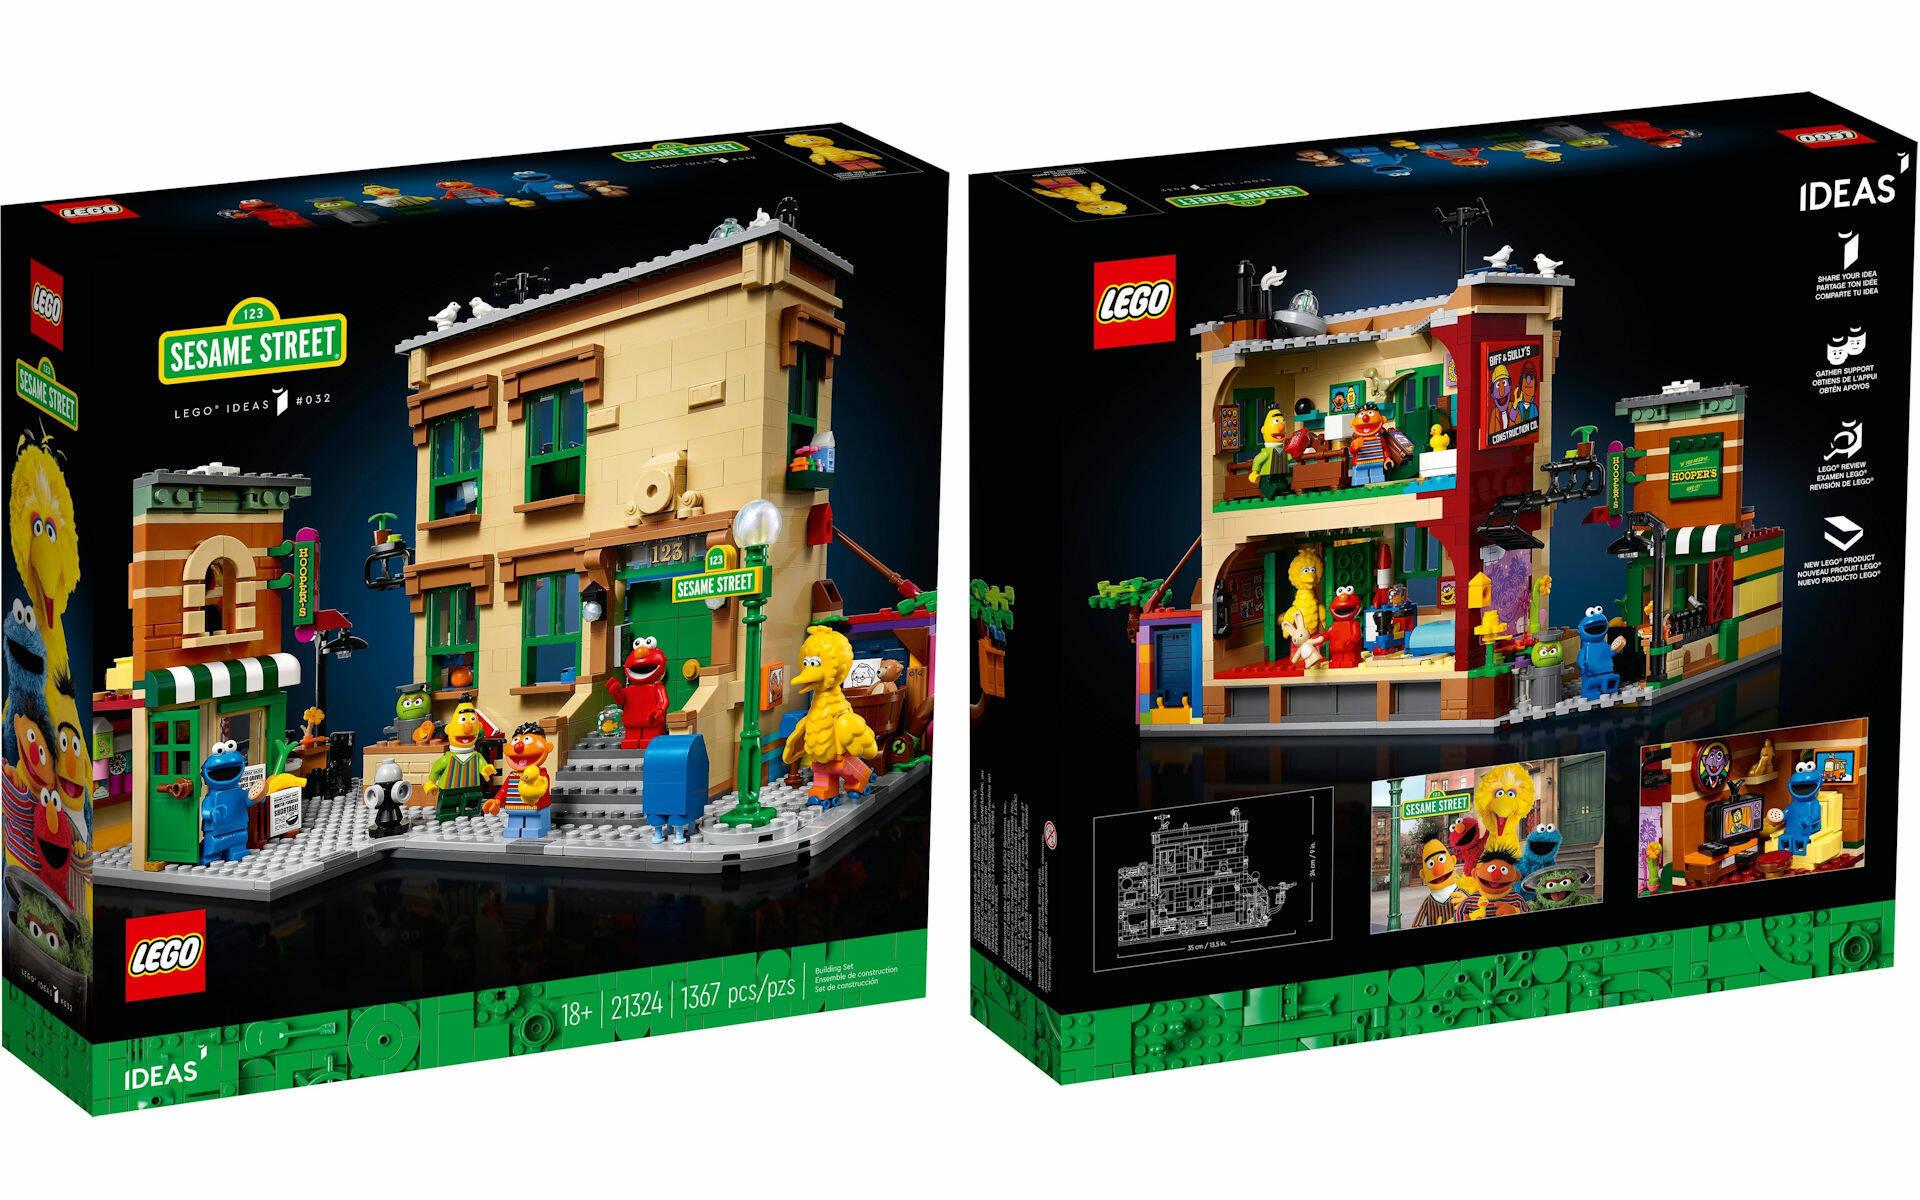 LEGO IDEAS SESAME STREET